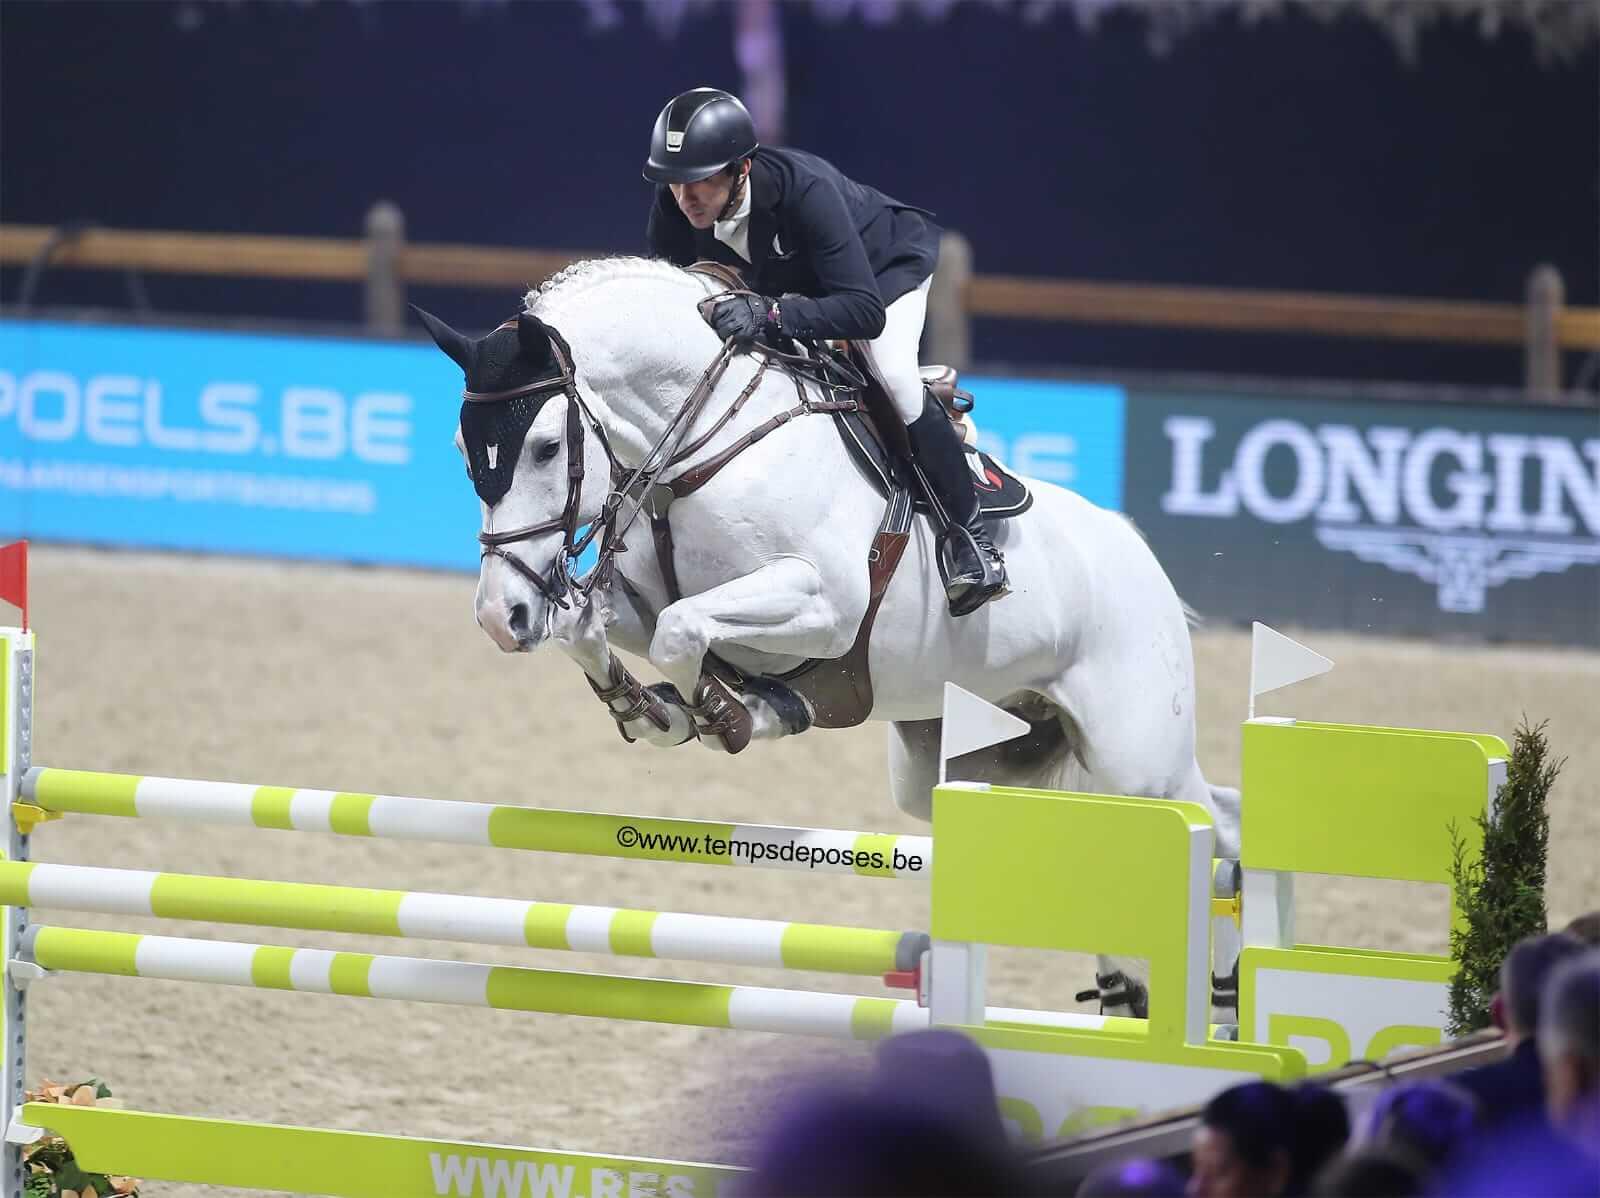 ALICANTE 5th in 150 CSIW5* Mechelen!